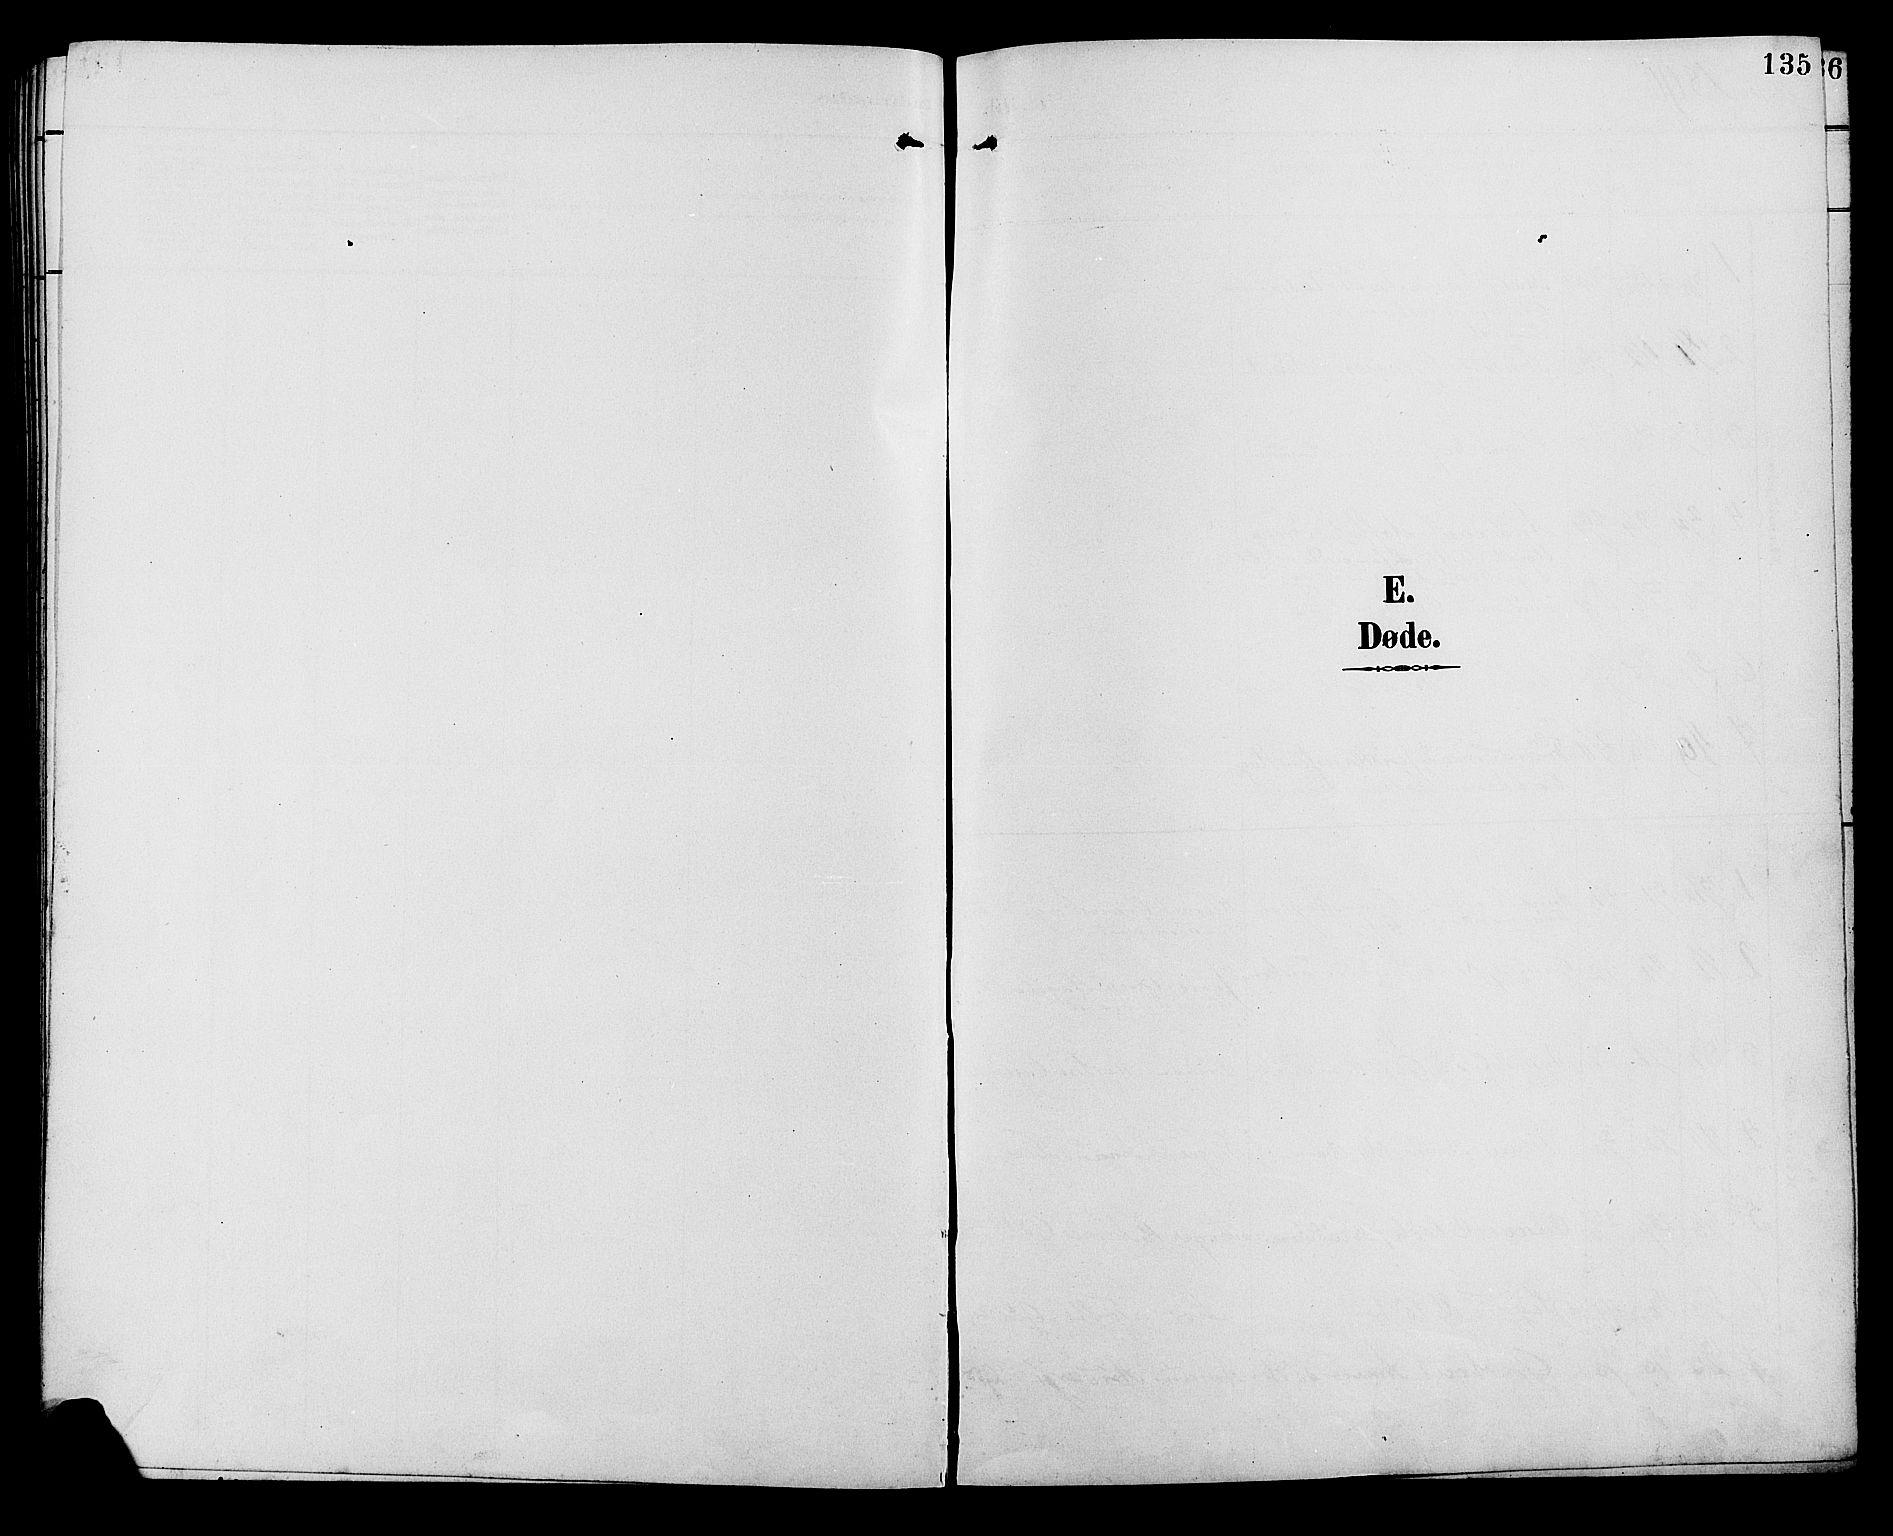 SAH, Ringebu prestekontor, Klokkerbok nr. 7, 1890-1910, s. 135